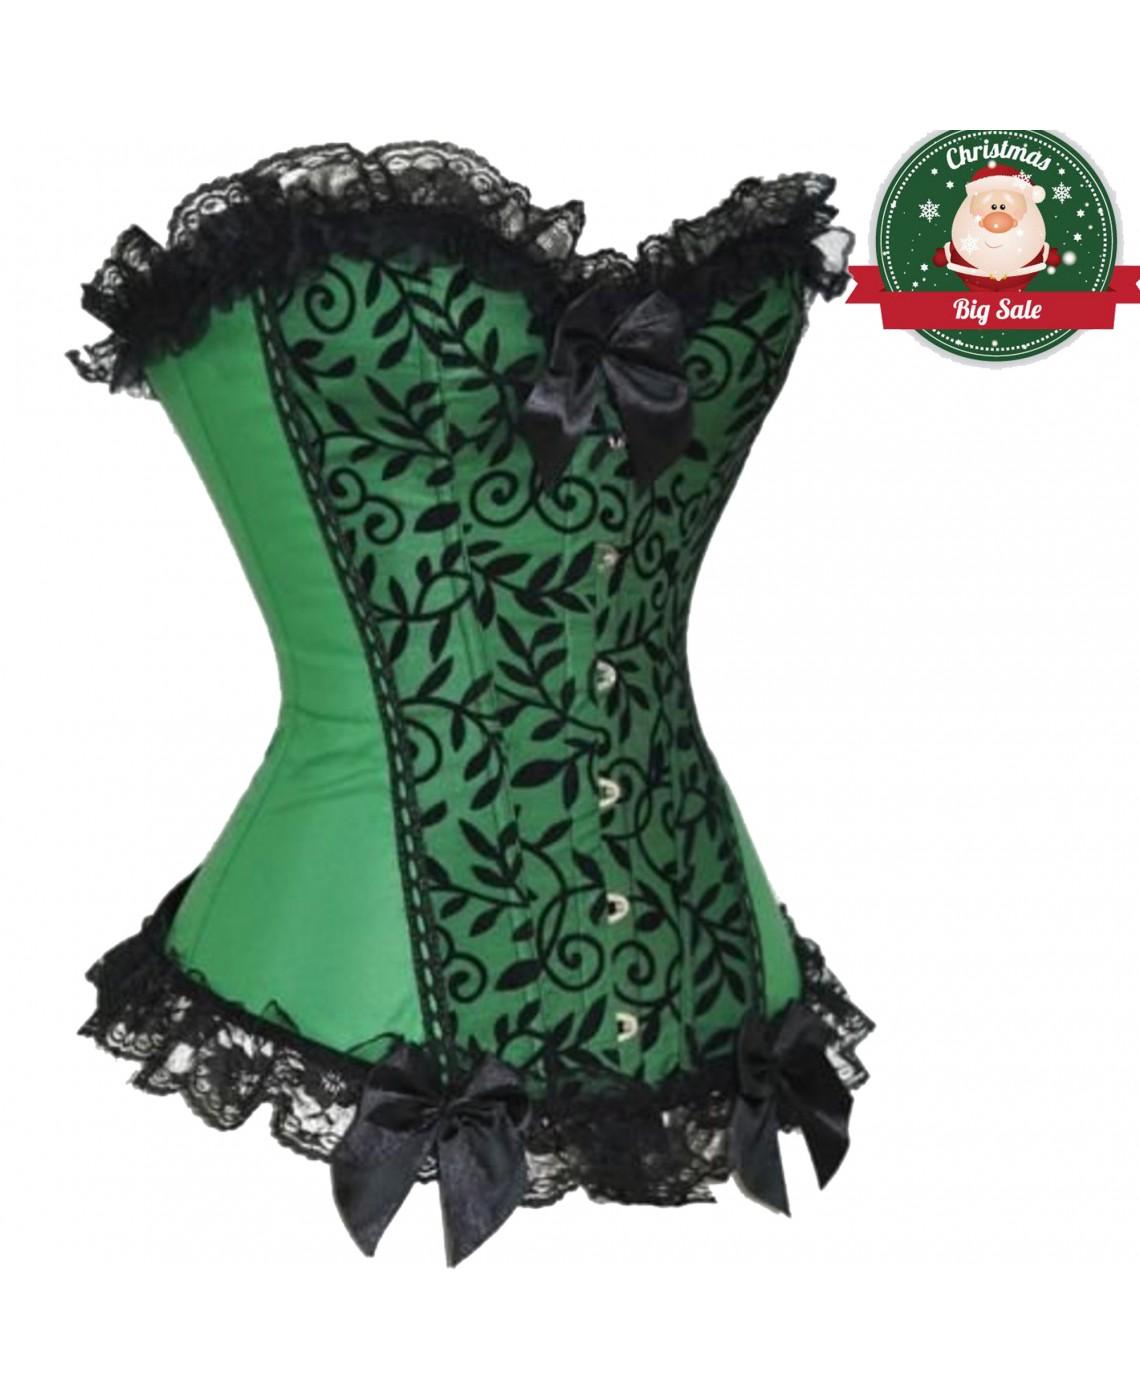 Women Steampunk Bustiers Corsets Overbust Waist Cinching Party Costume Tops Green